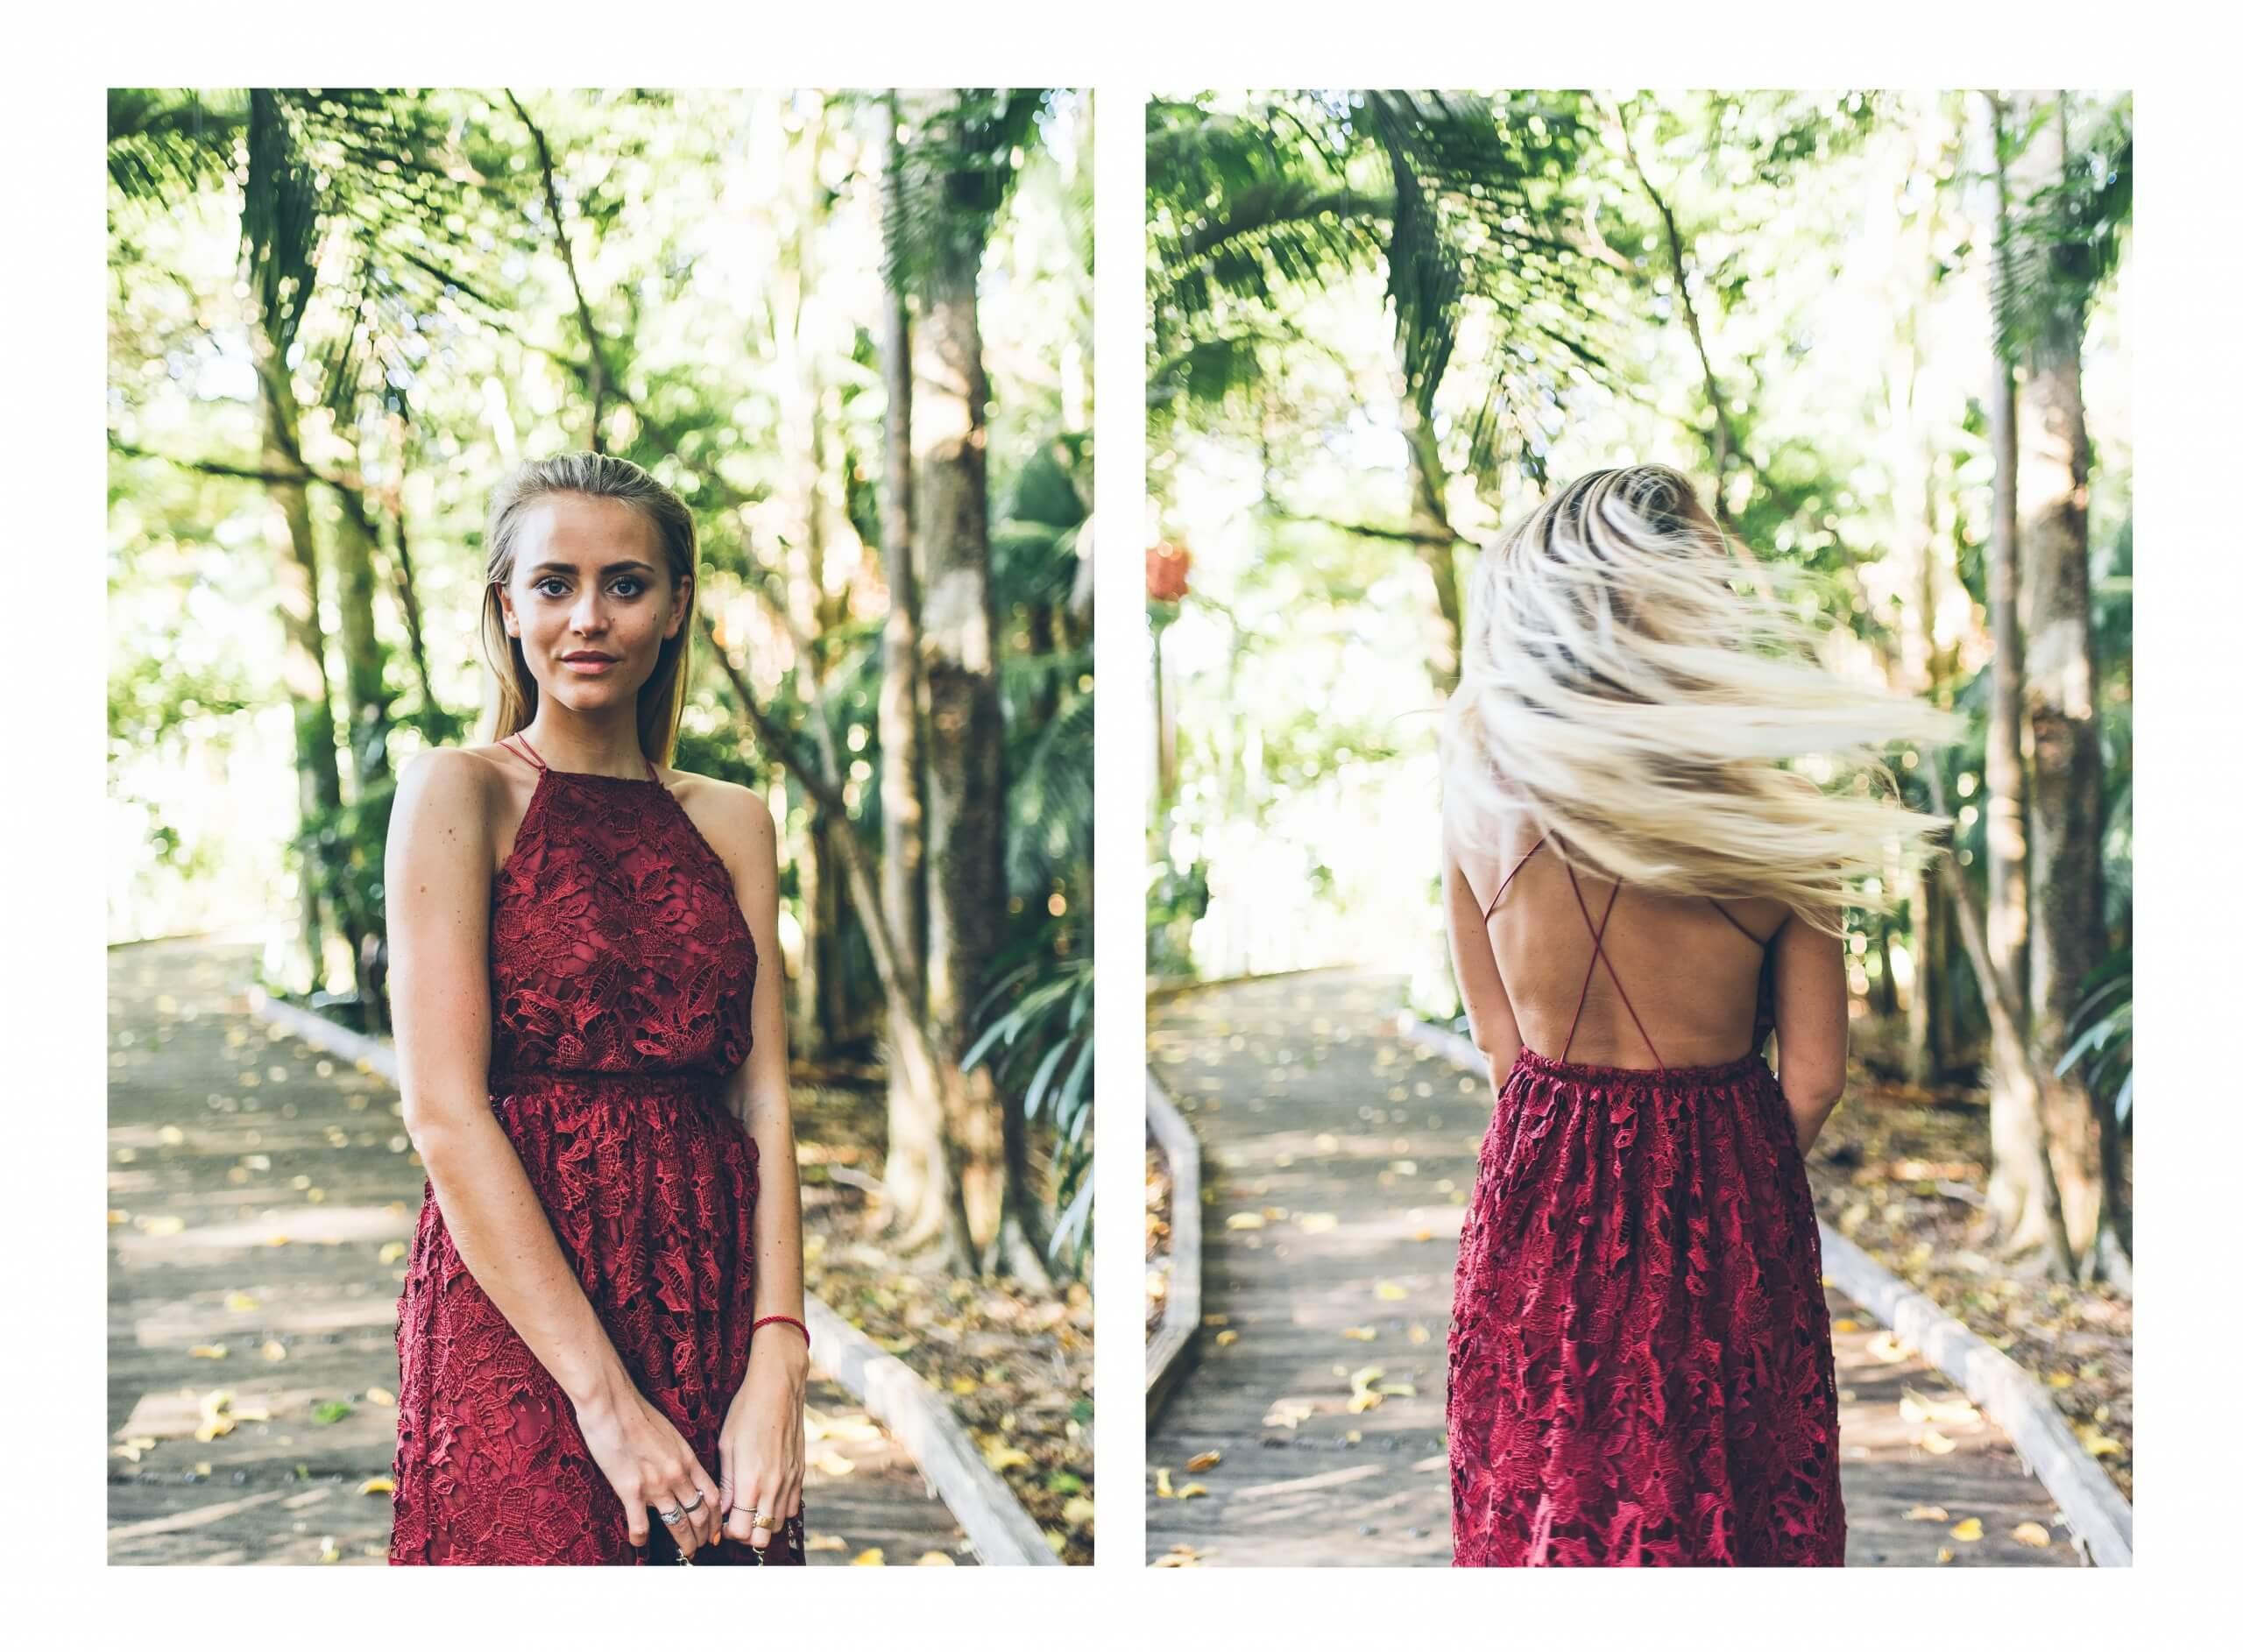 janni-deler-jungle-look-dress-byronDSC_3736 copy